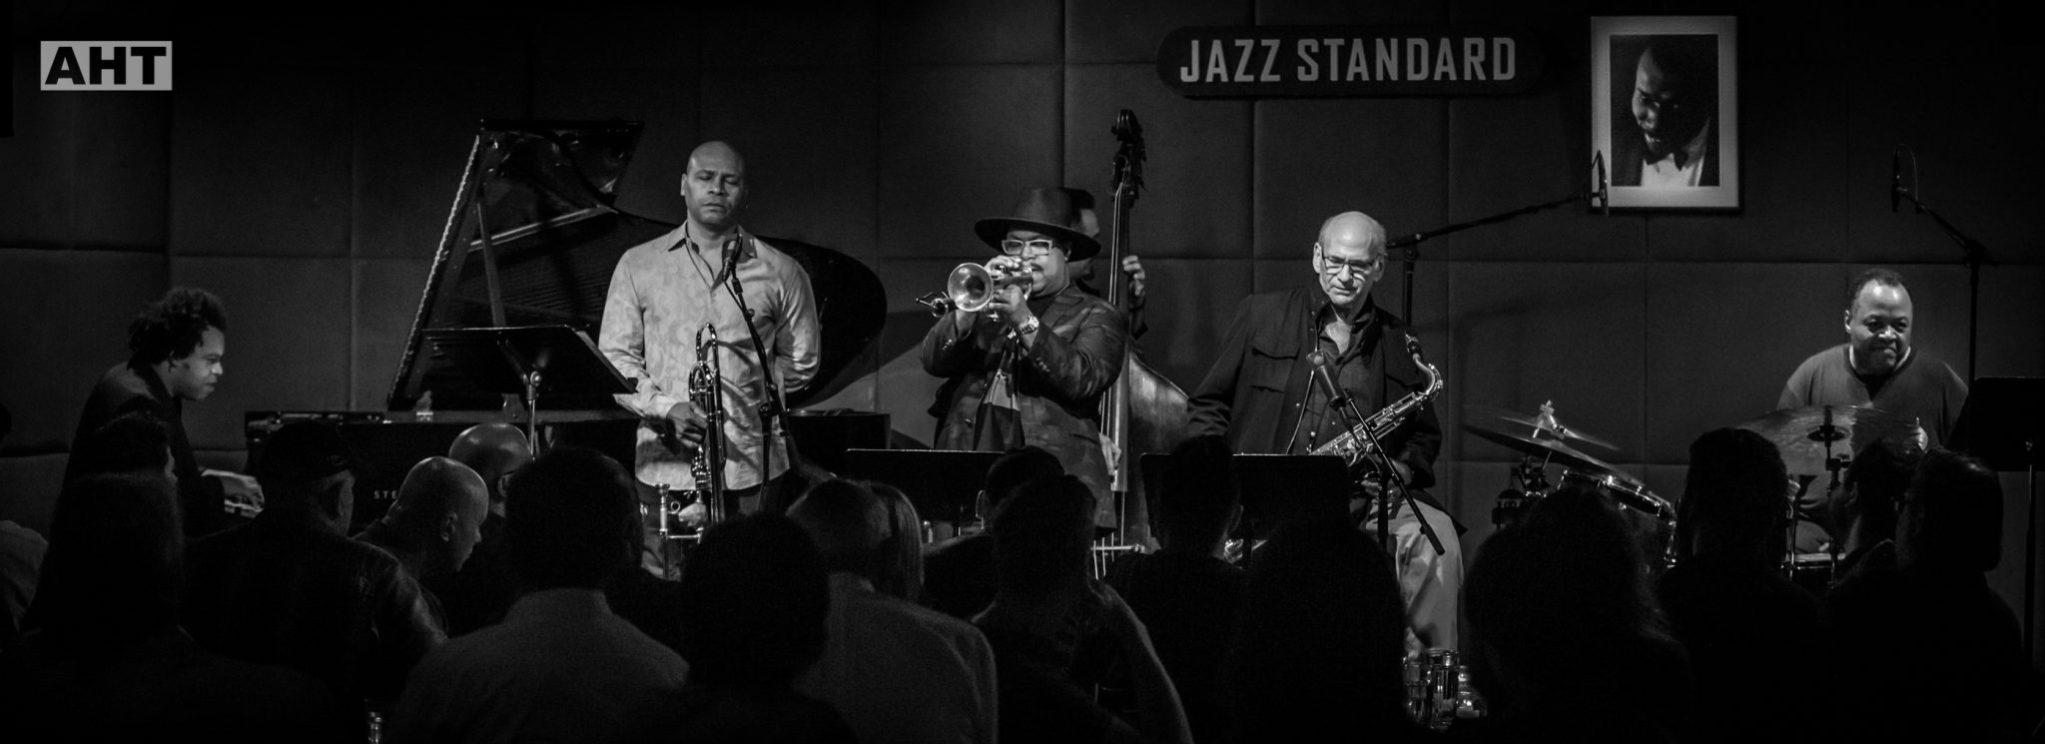 Elvin Jones Celebration at Jazz Standard